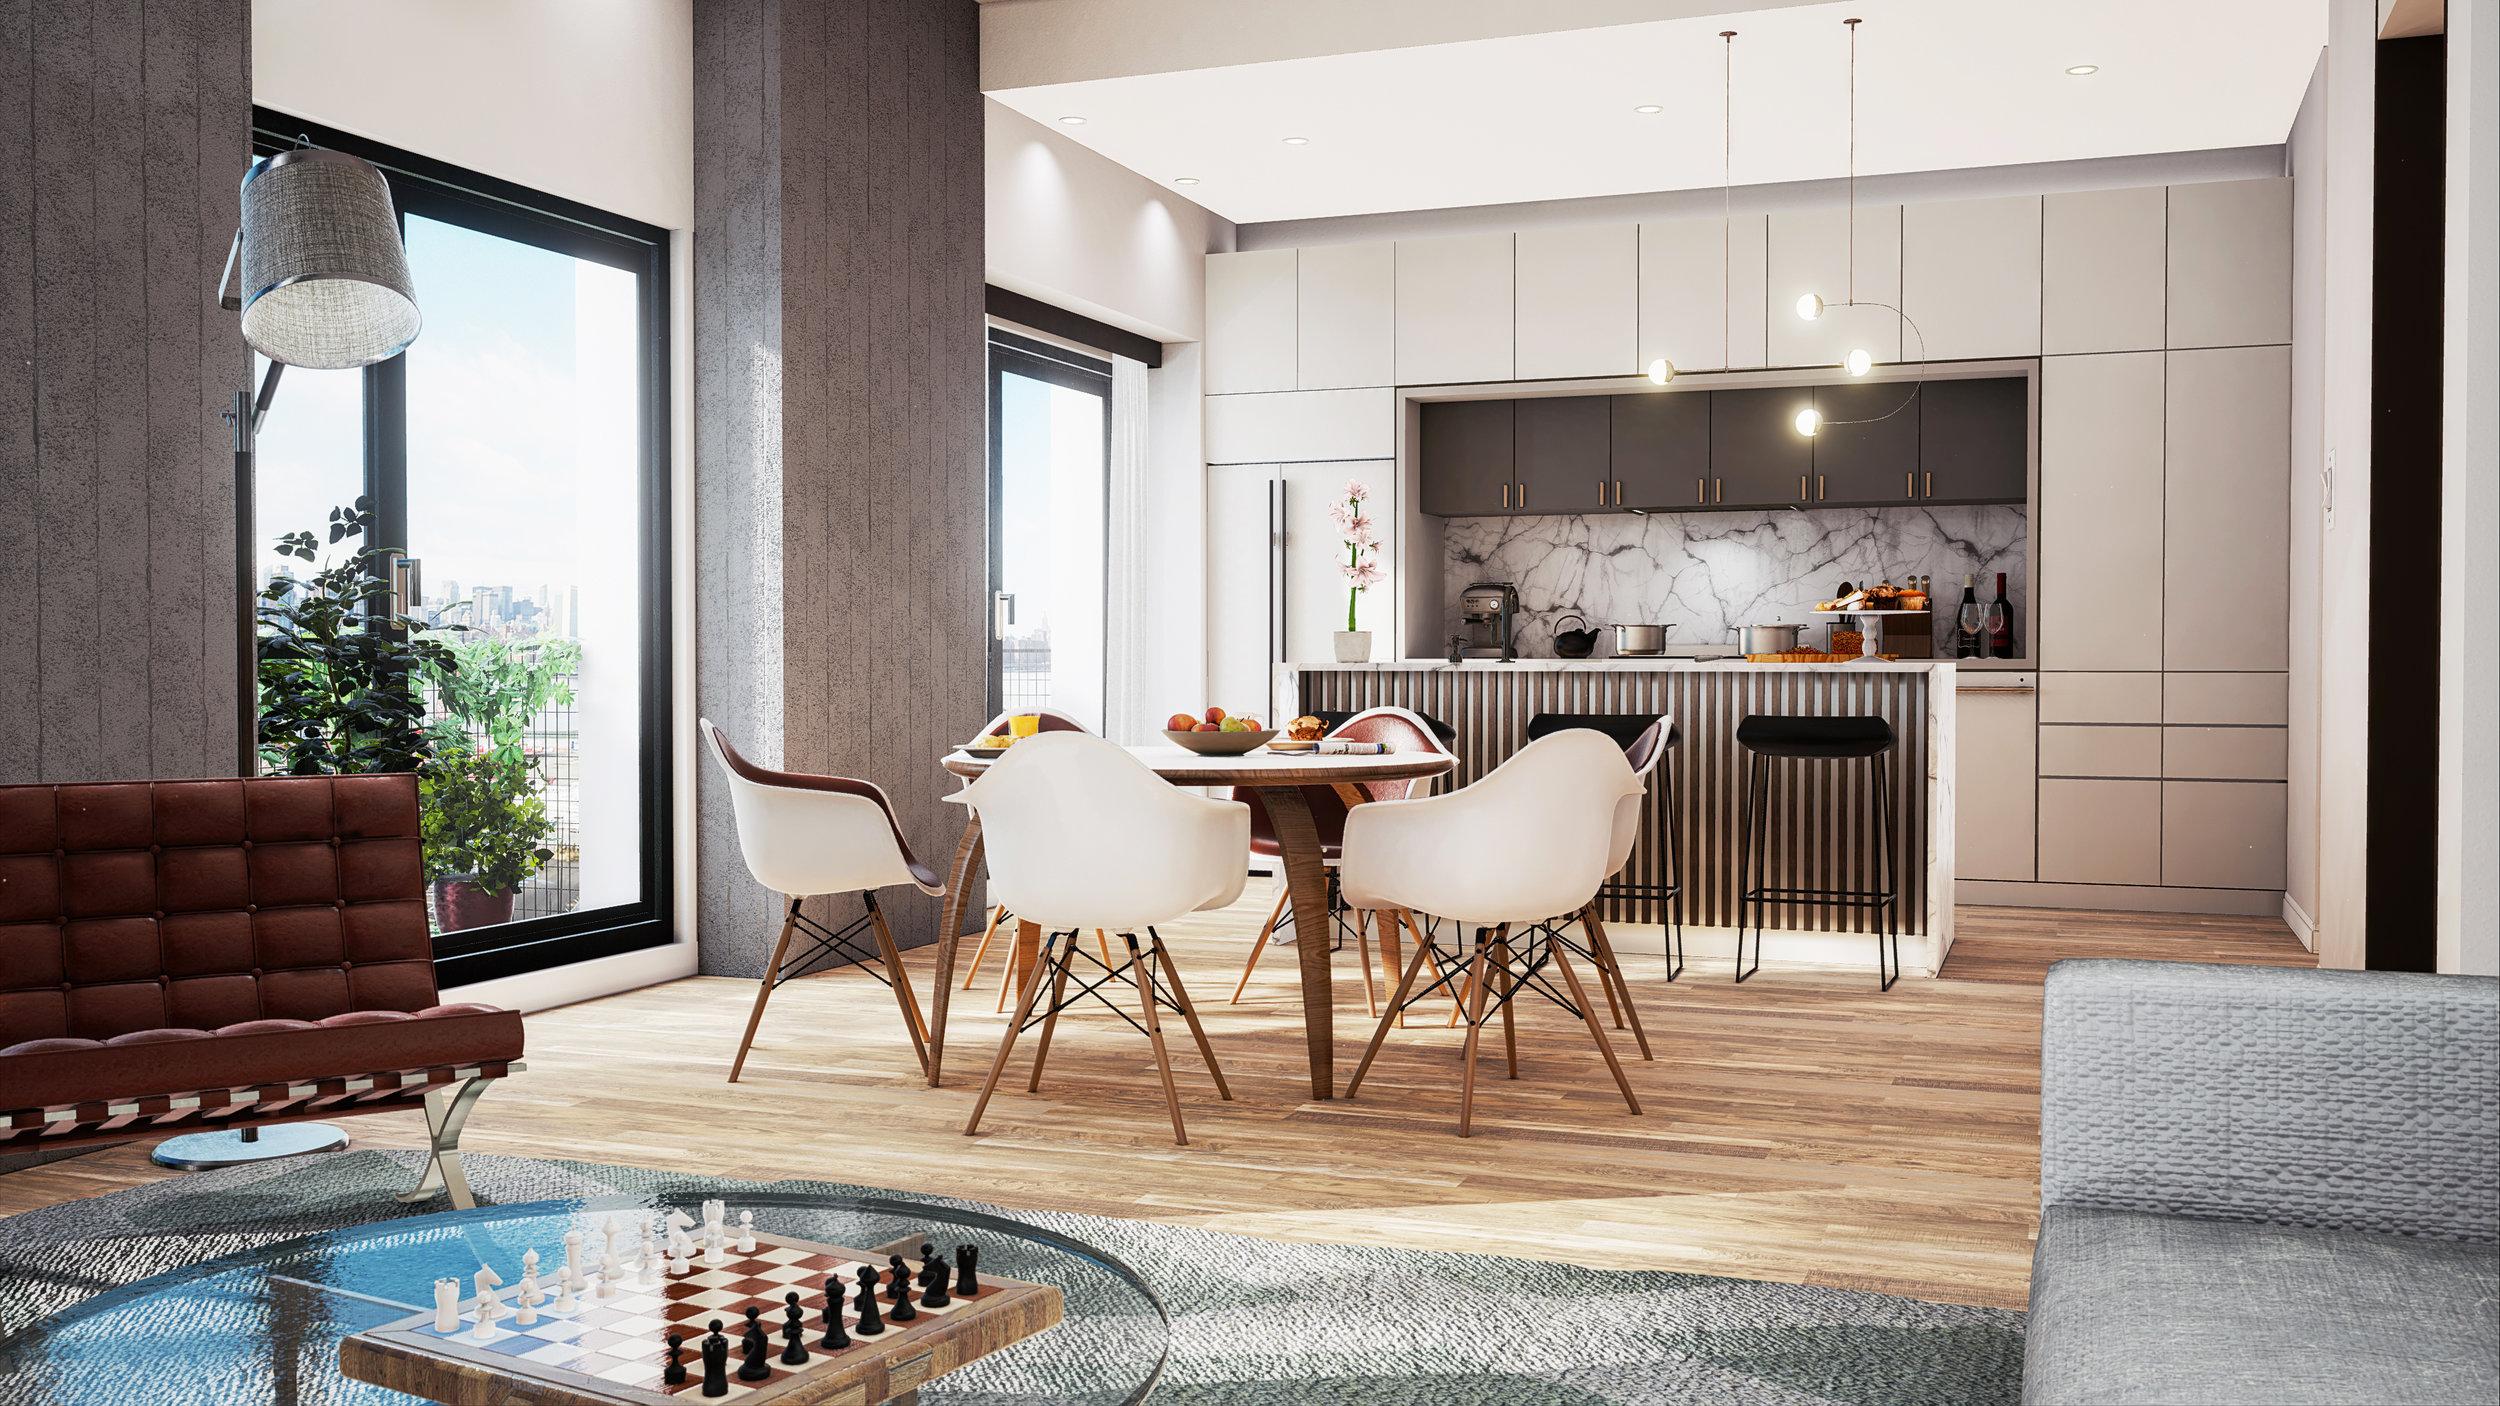 LivingRoom_Facing-Kitchen.jpg